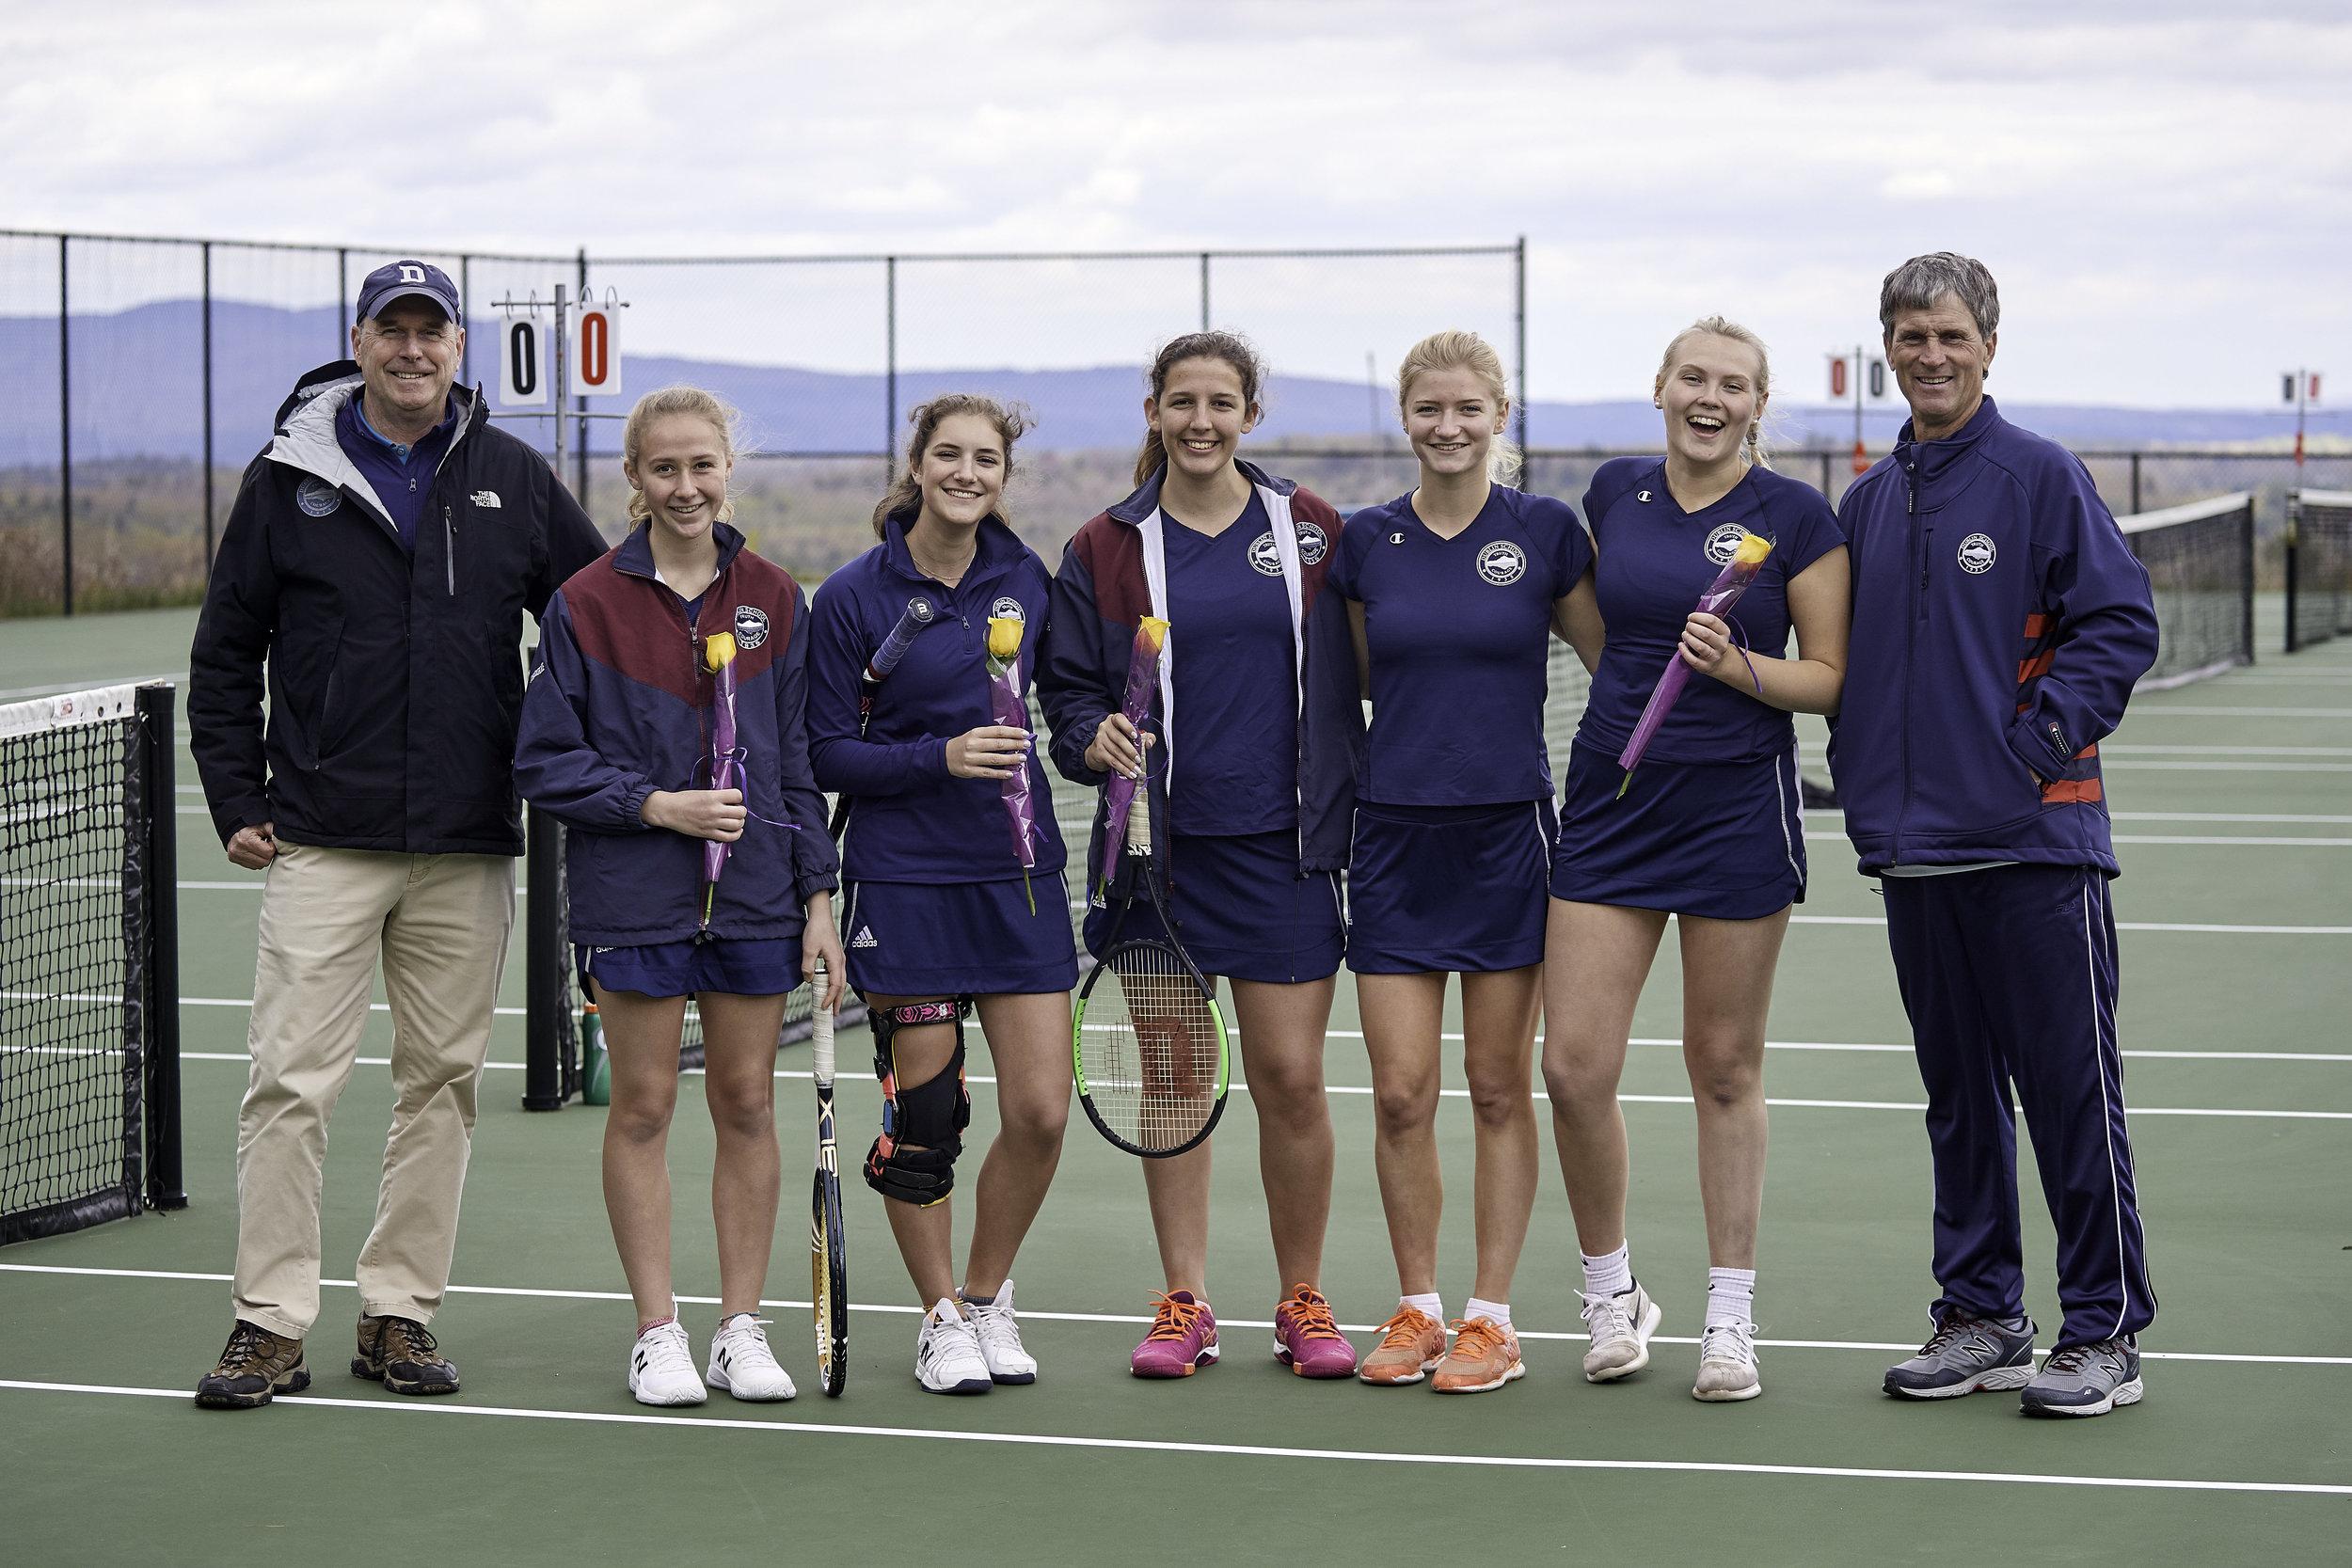 Girls Tennis vs. Winchendon School - May 15, 2019 -195147.jpg